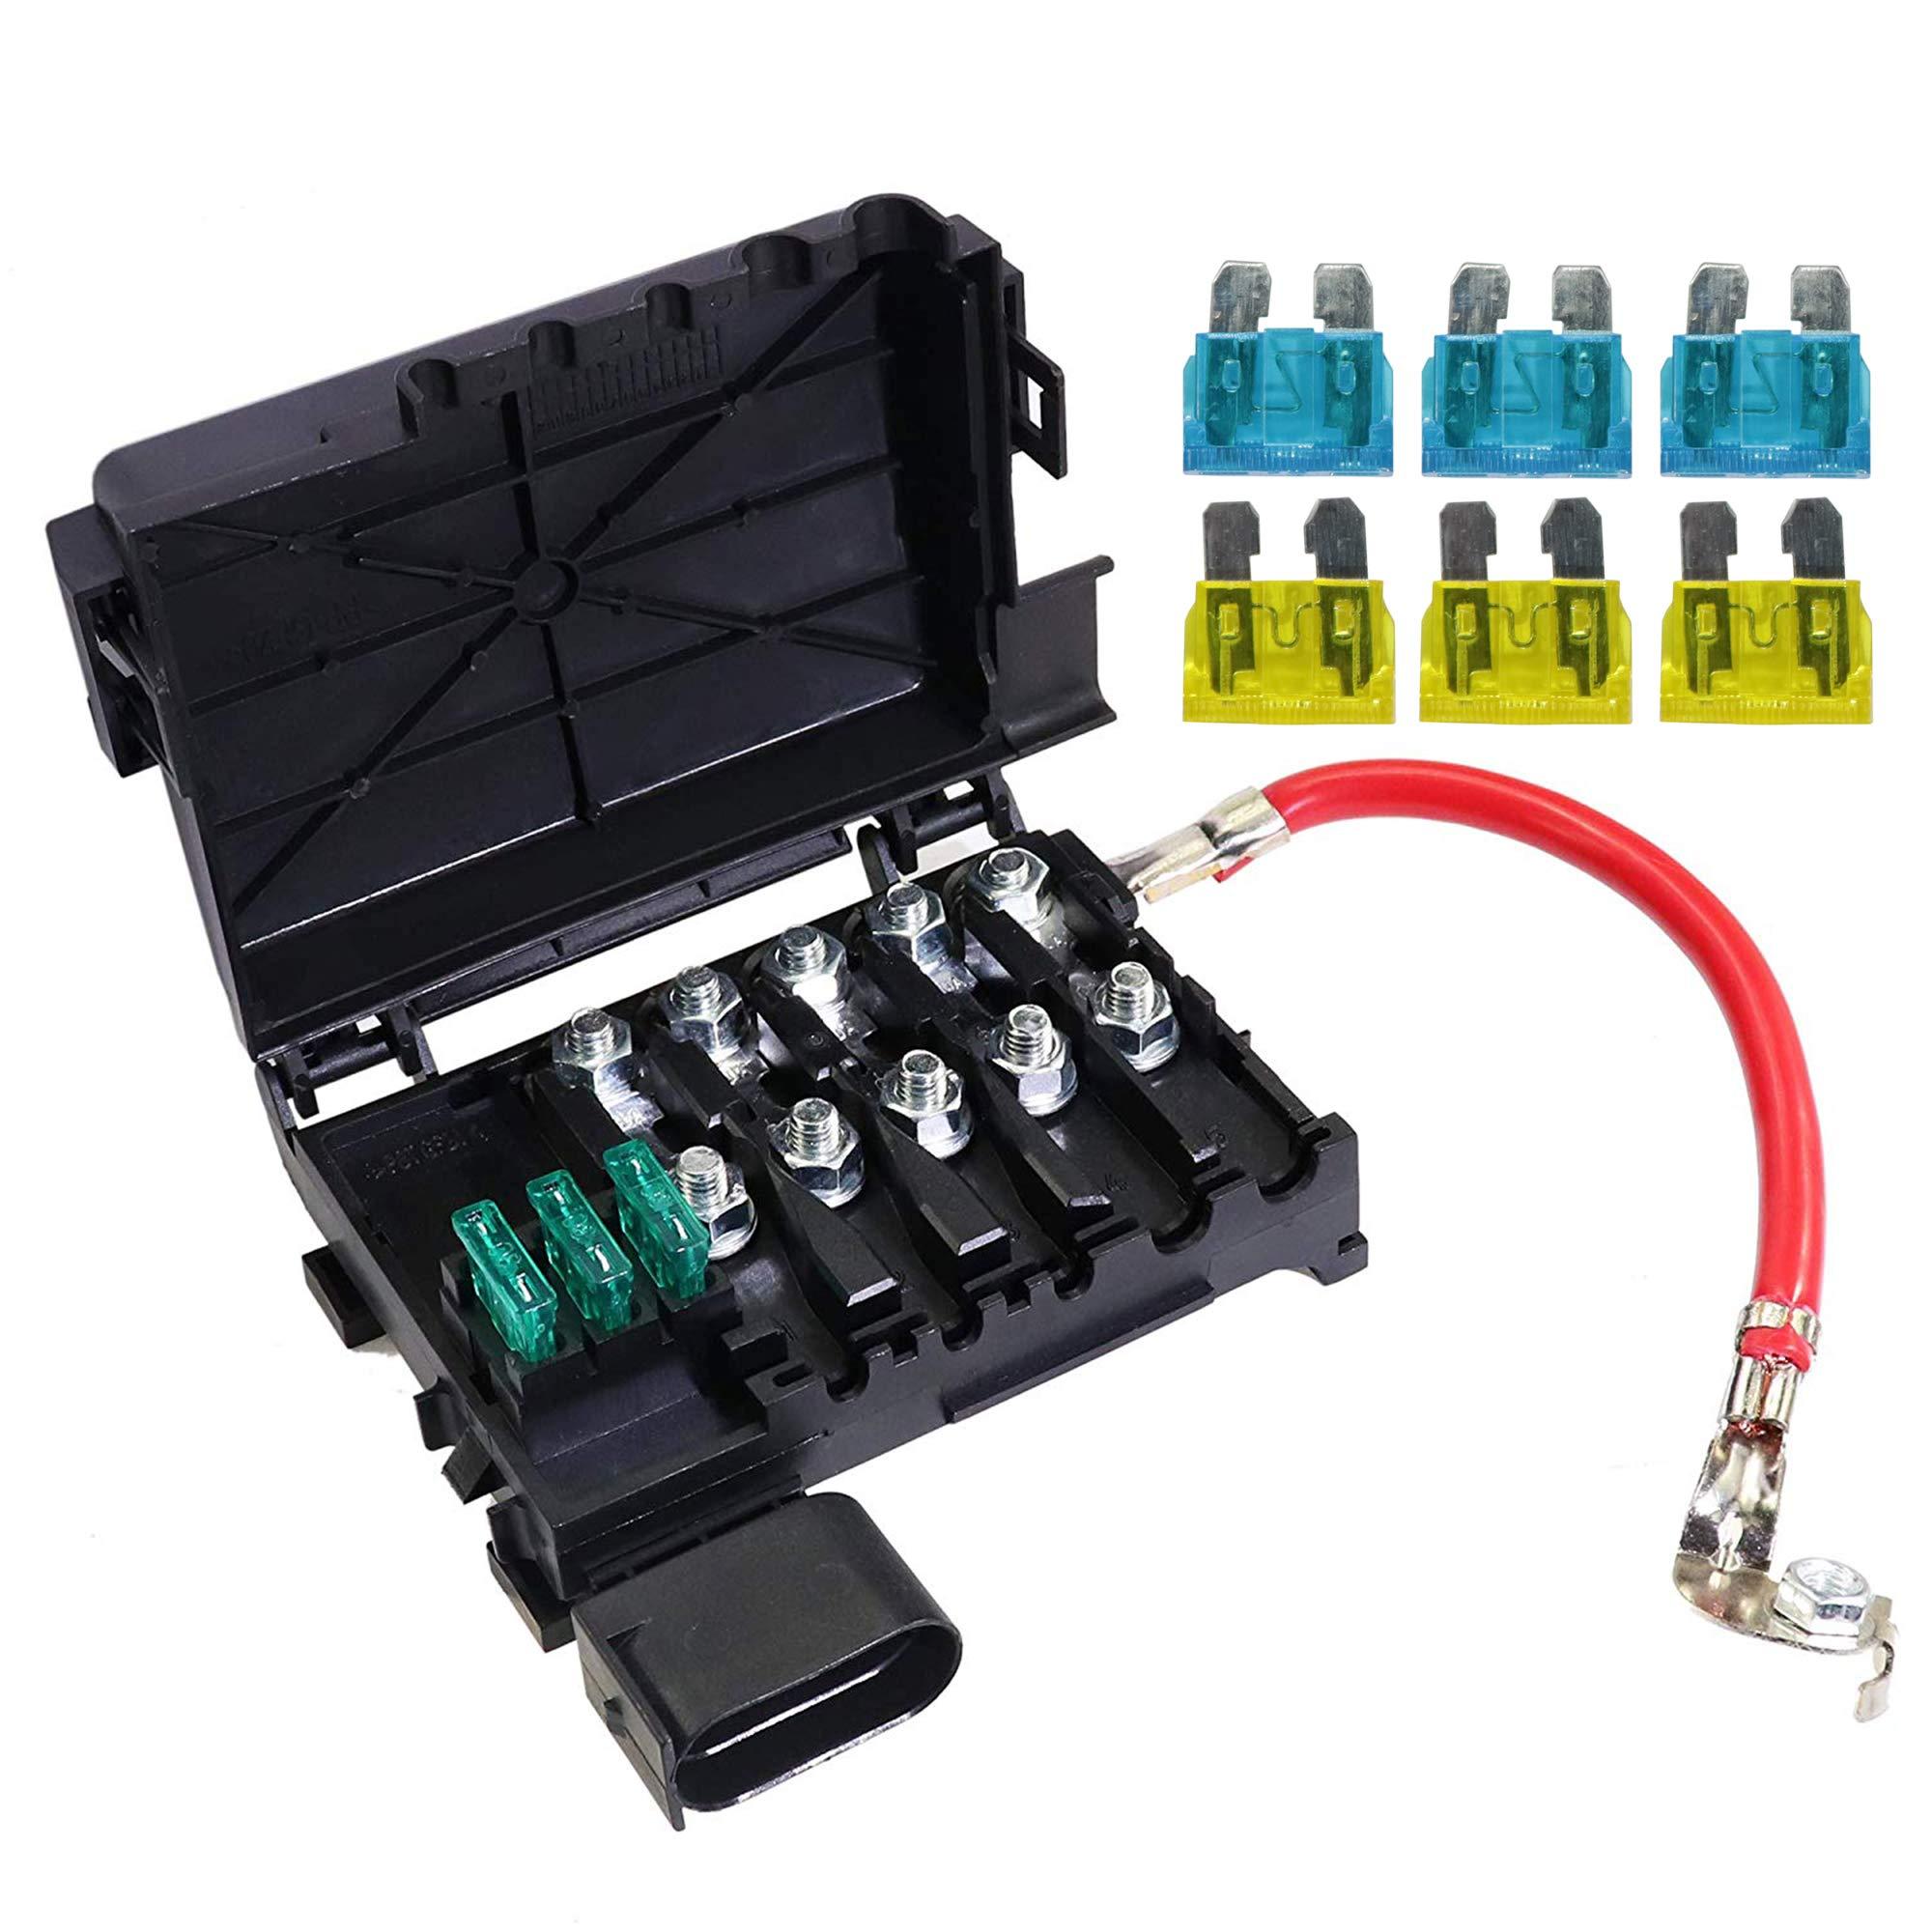 jetta battery fuse box fuse box battery terminal for 1999 2004 vw jetta golf mk4  1999 2004 vw jetta golf mk4